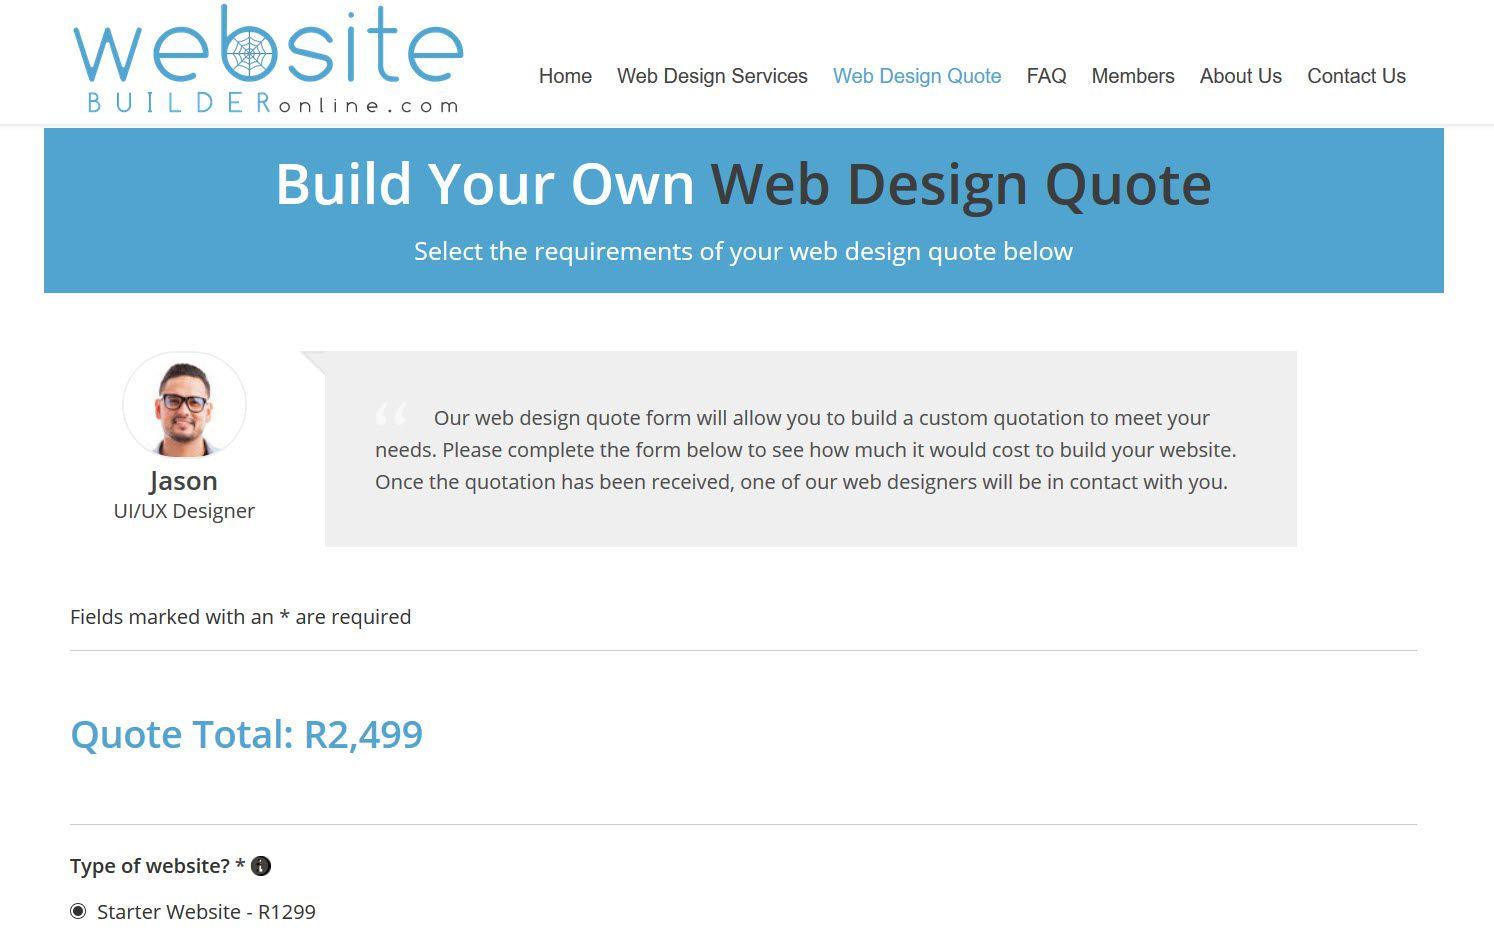 Web Design Quotation Template In 2020 Web Design Quotations Quotation Template Word